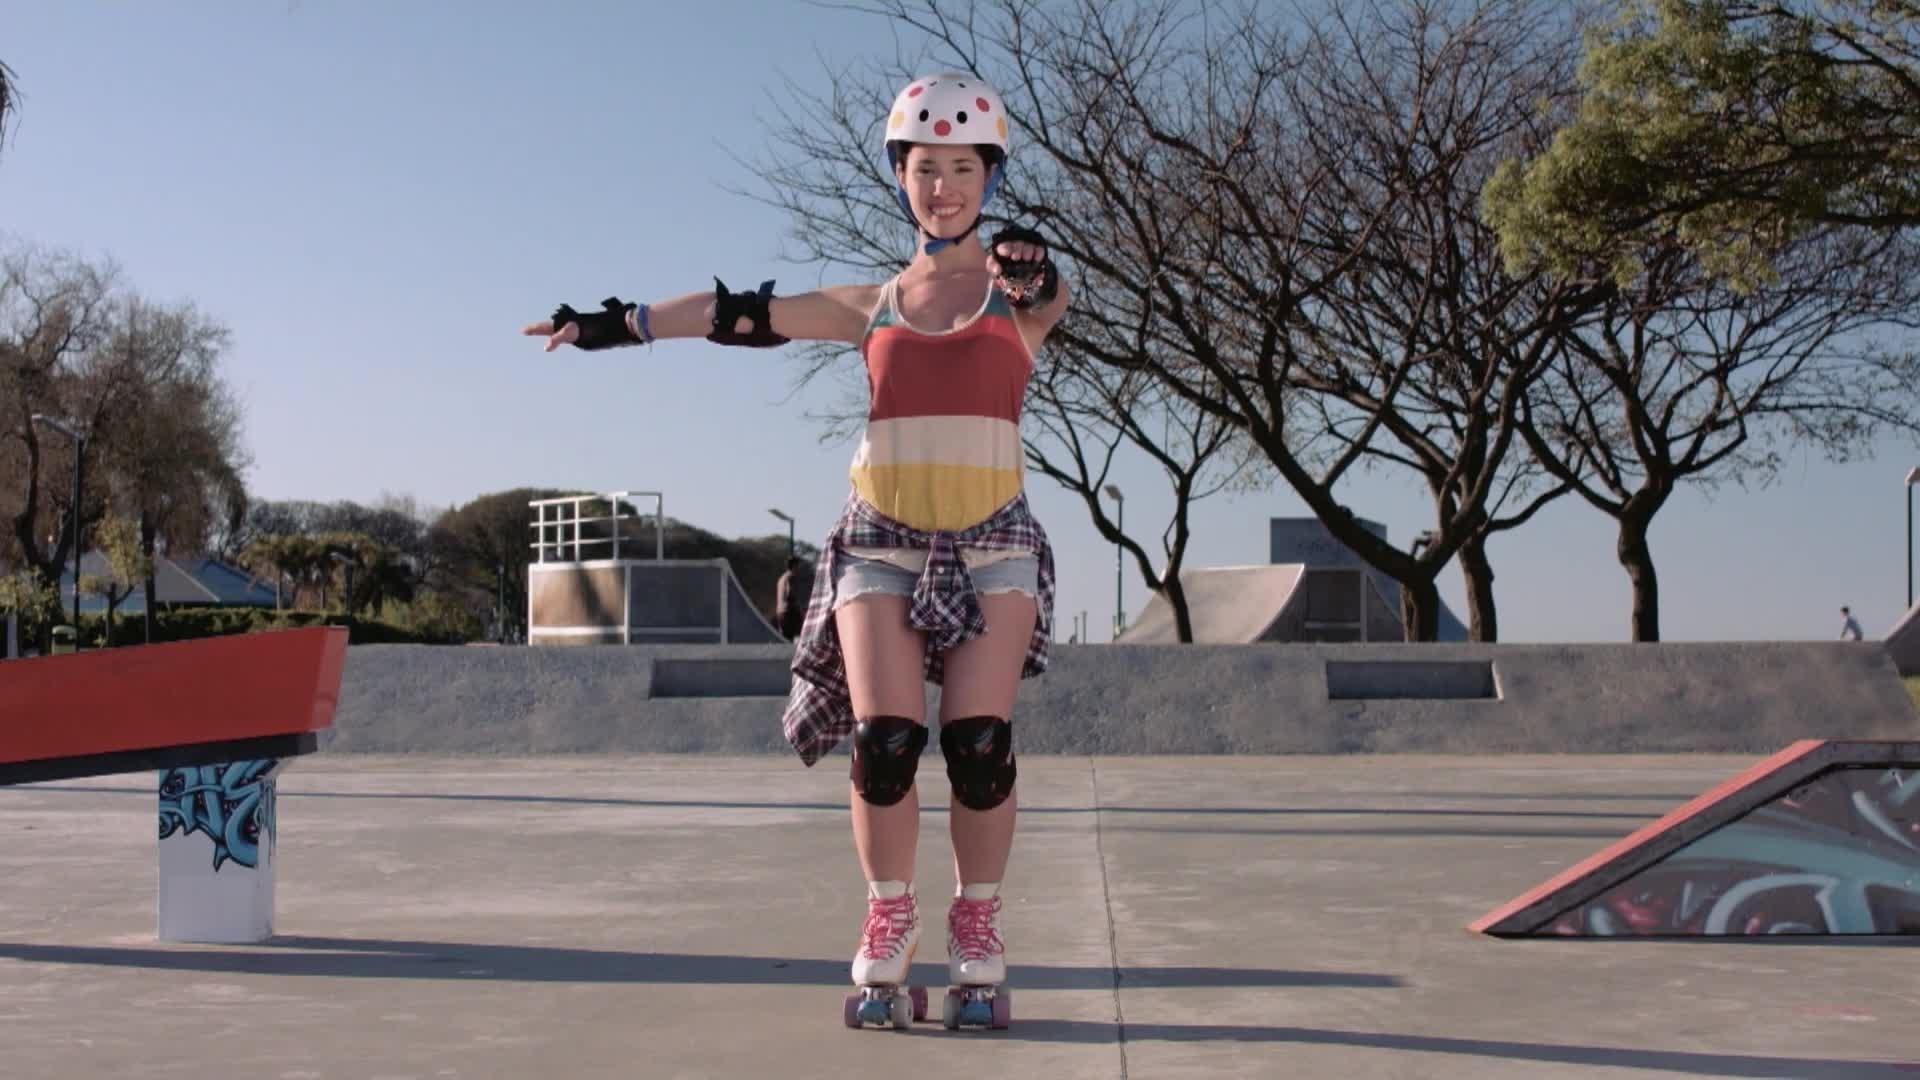 Tutorial Skate - Hoy Se Patina 5